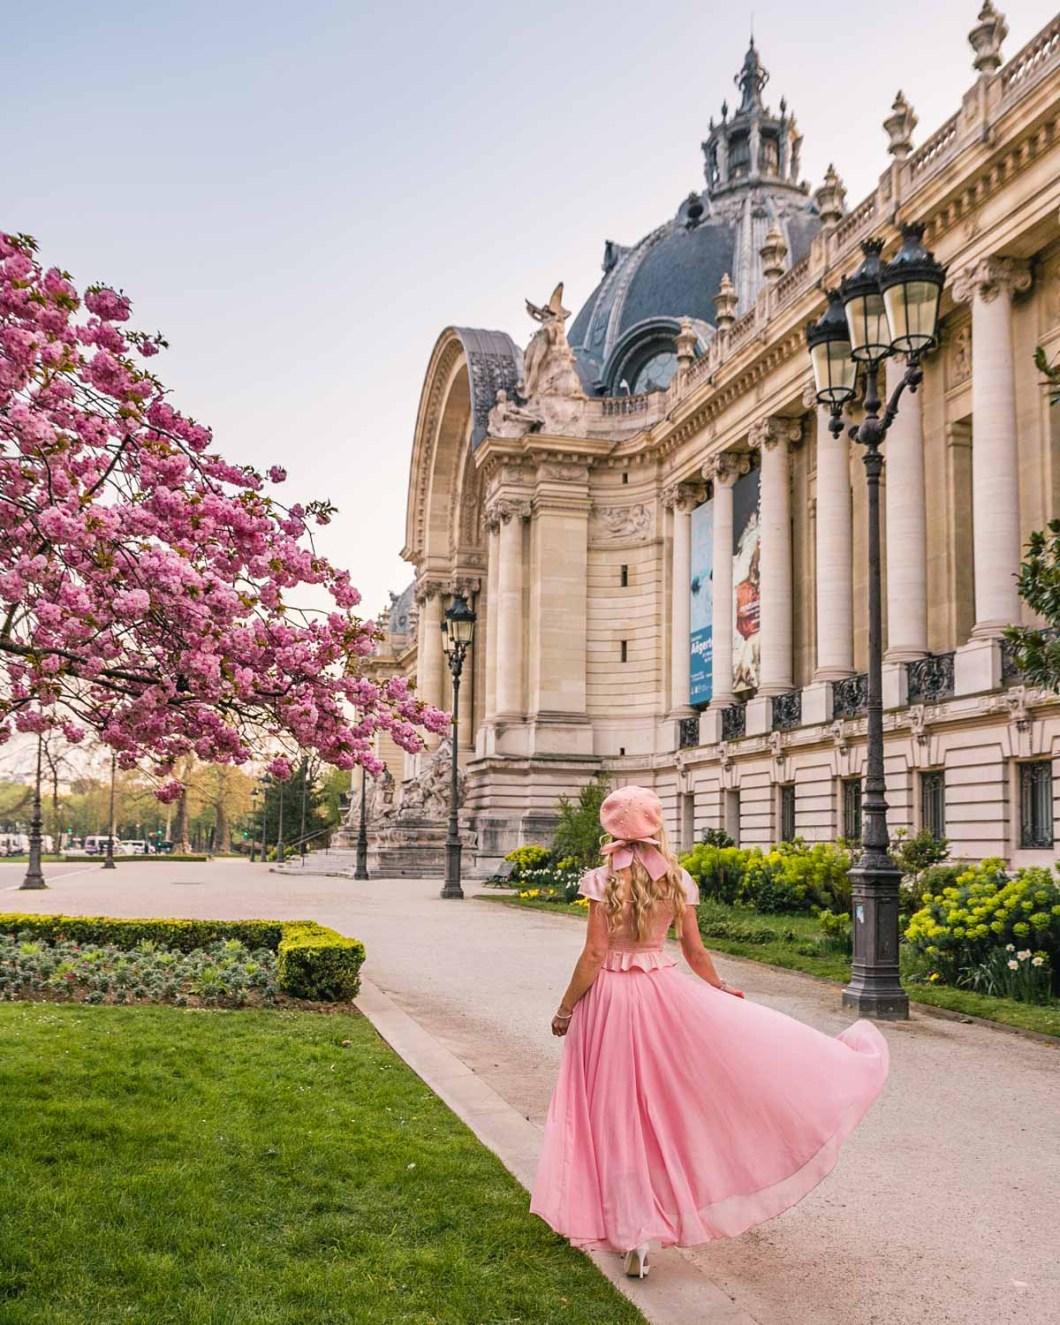 Cherry blossoms in front of the Petit Palais - Paris